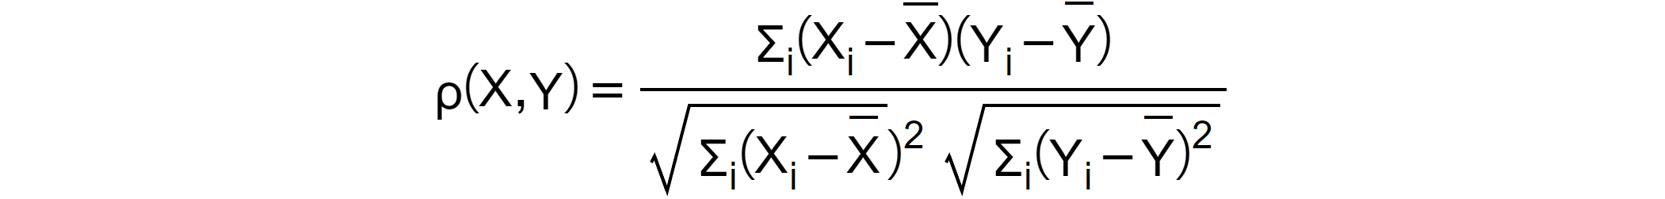 Figure 1.18: The correlation coefficient between X and Y